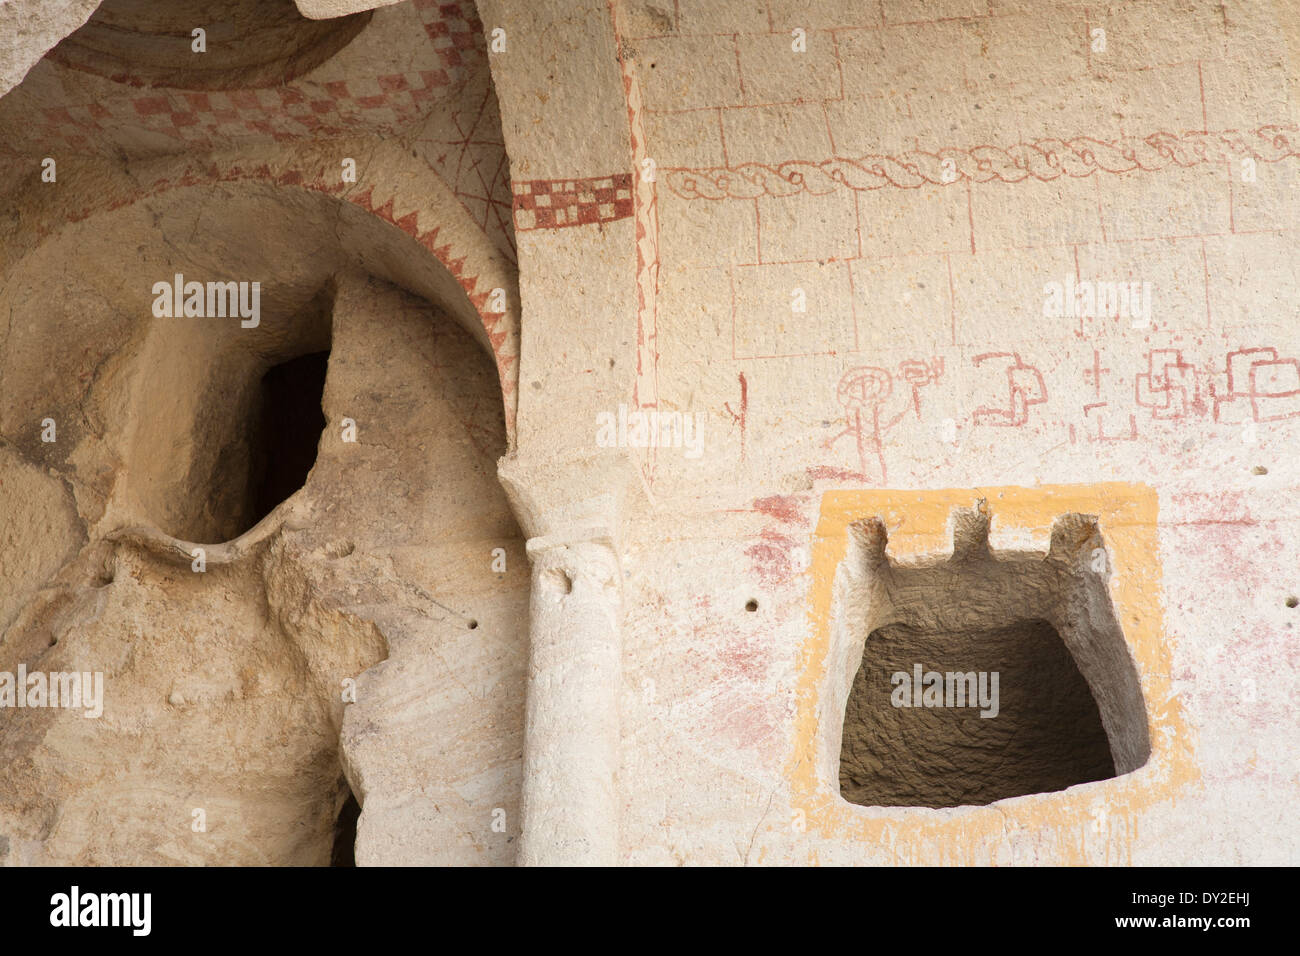 the dark church, open-air museum of goreme, cappadocia, anatolia, turkey, asia - Stock Image